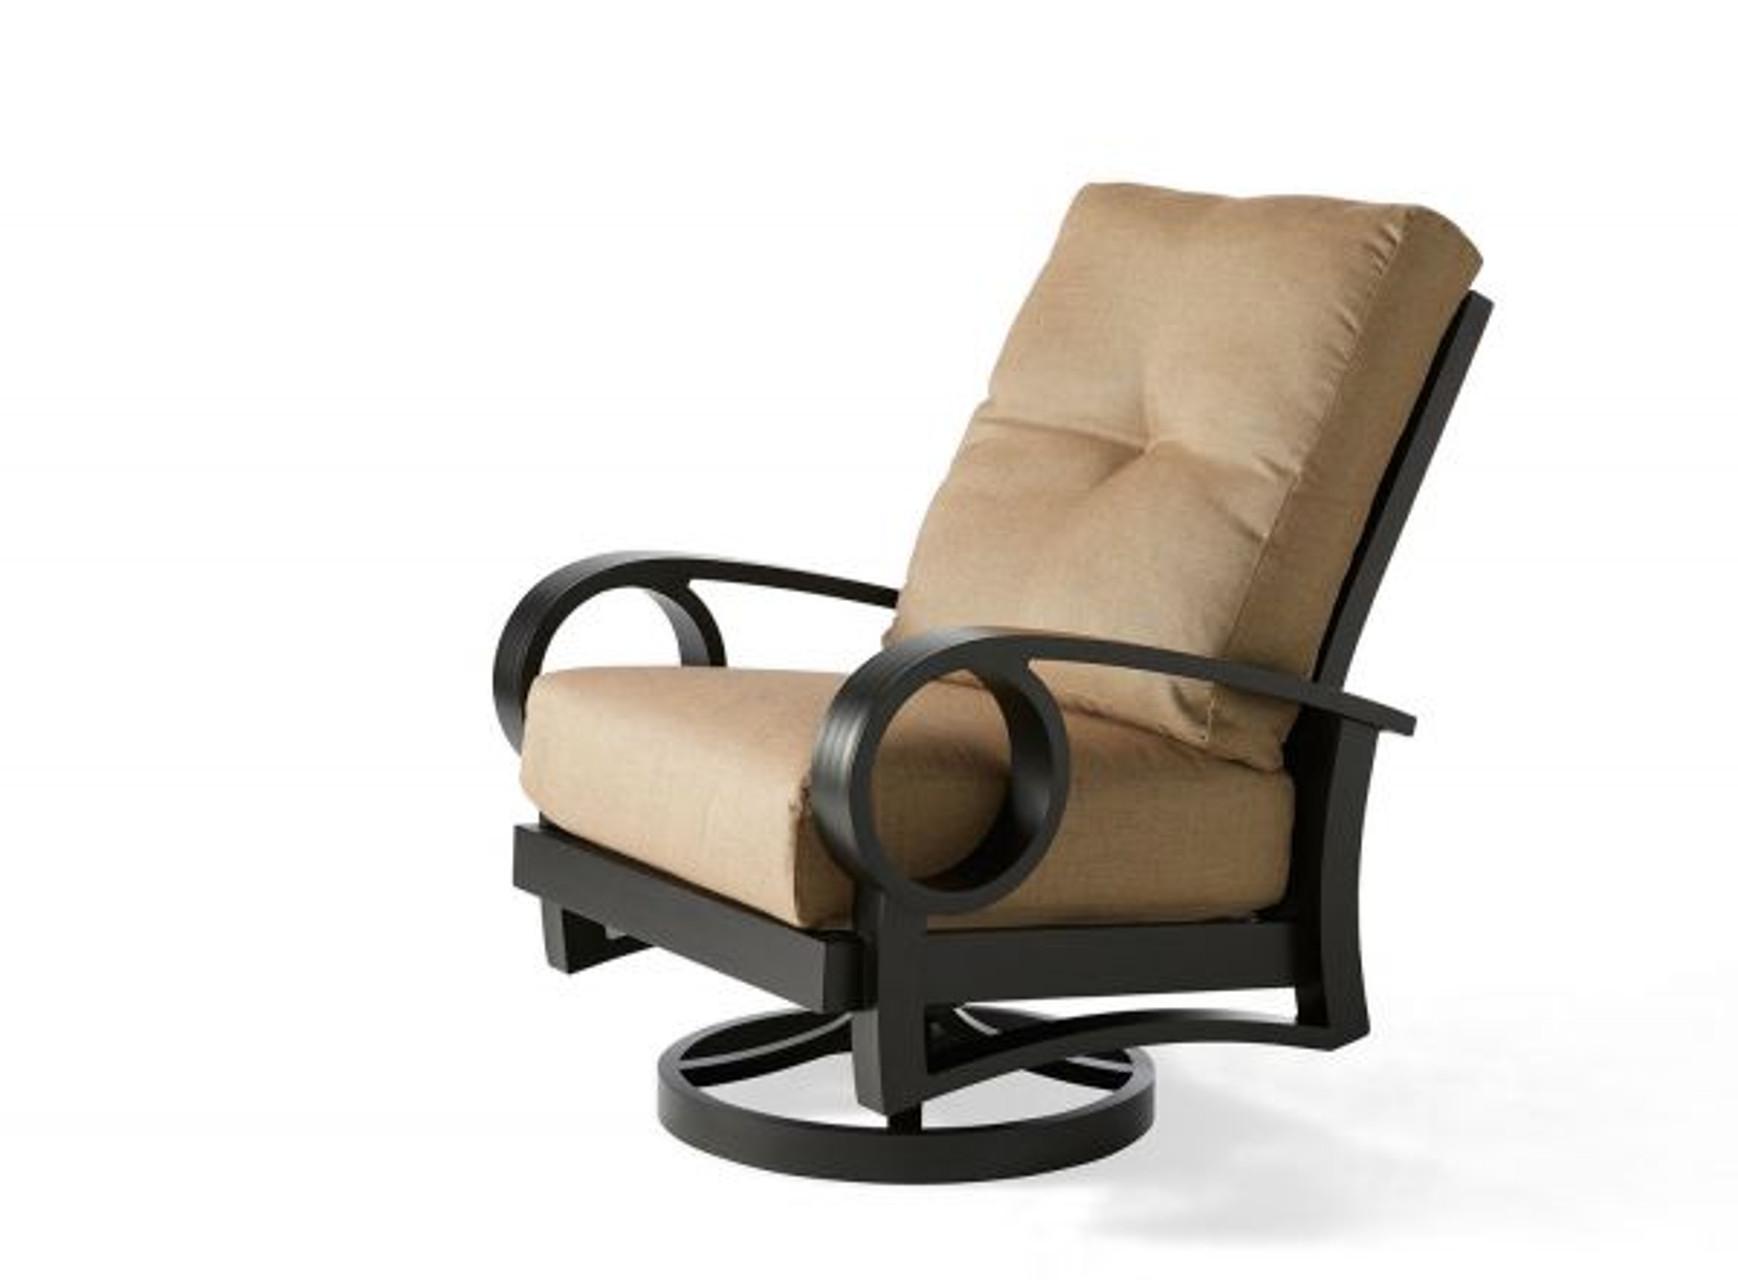 eclipse cushion swivel rocking lounge chair